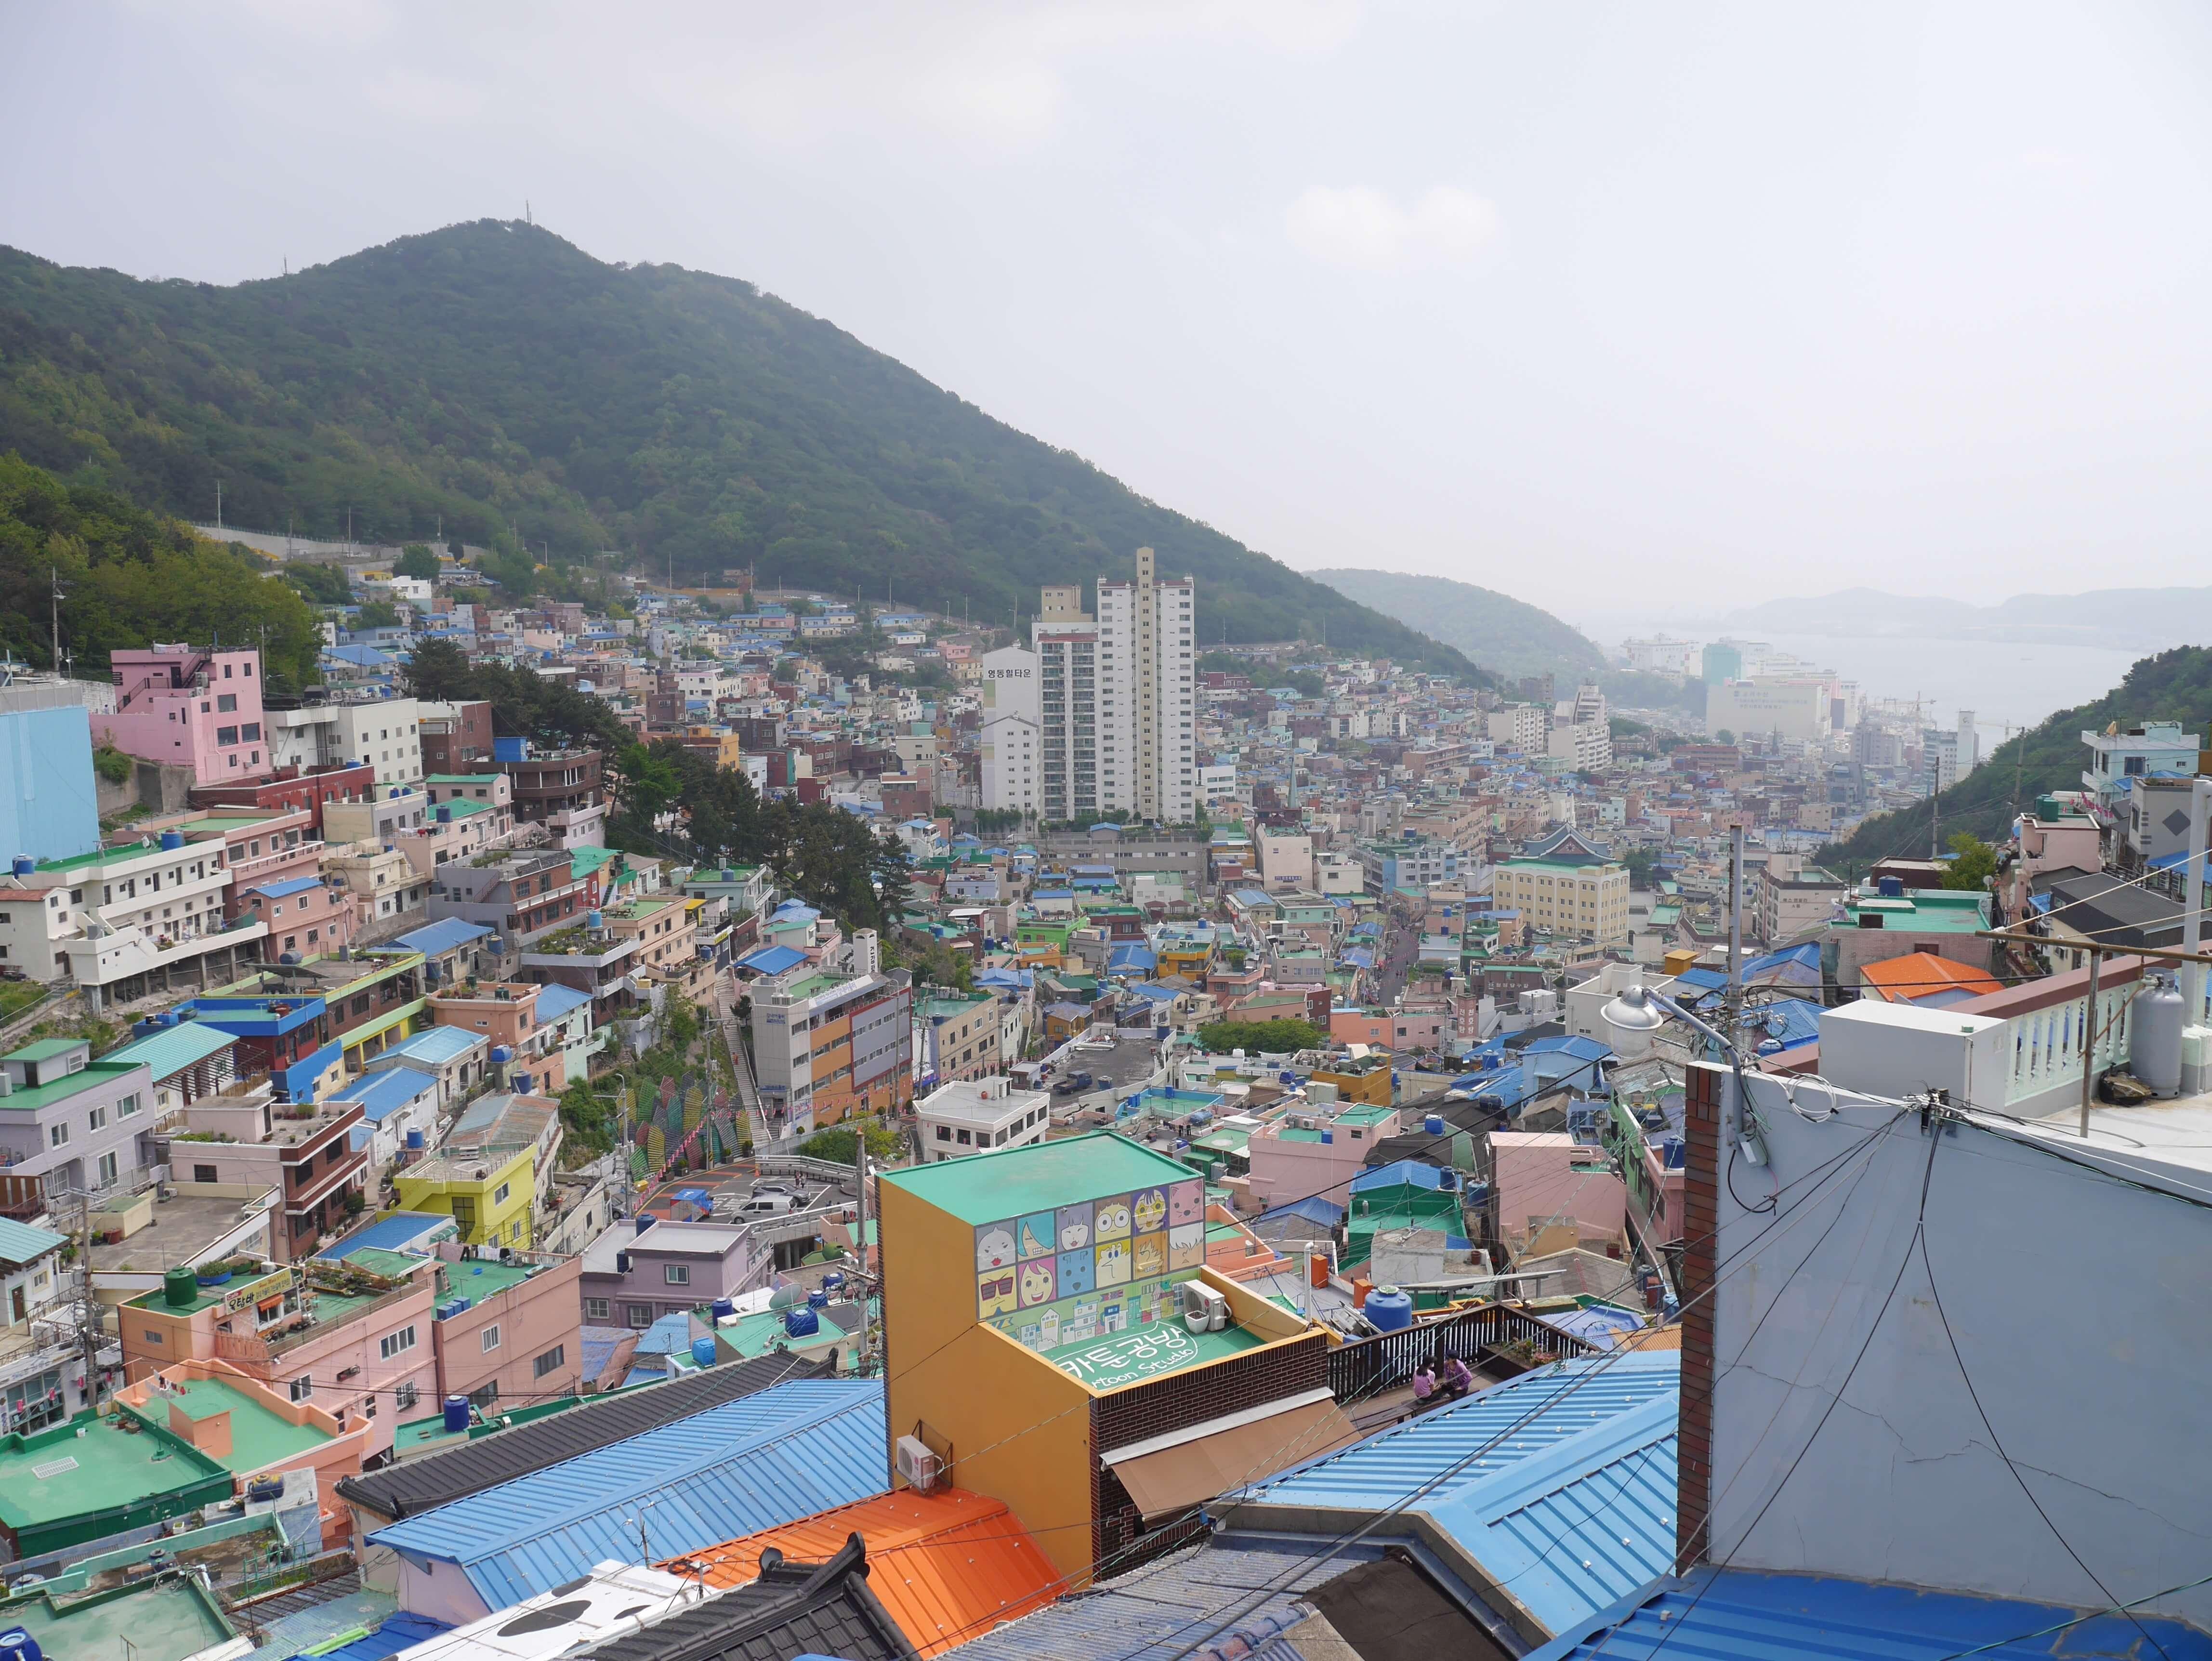 Gamcheon-Busan-Korea-buildings-colourful